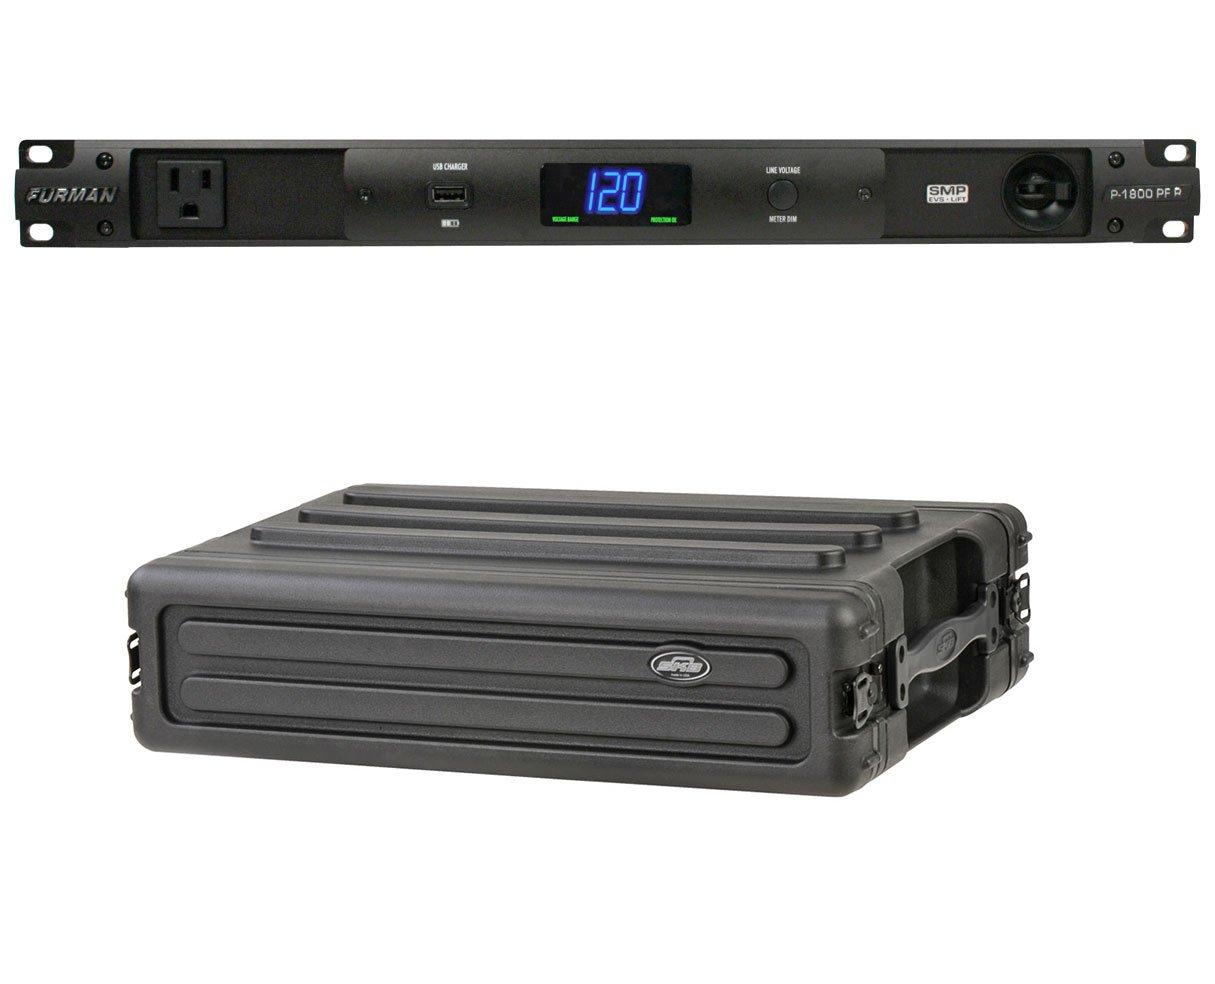 Furman P-1800 PF R 15 Amp Power Conditioner + SKB 1SKB-R2S 2U Shallow Rack